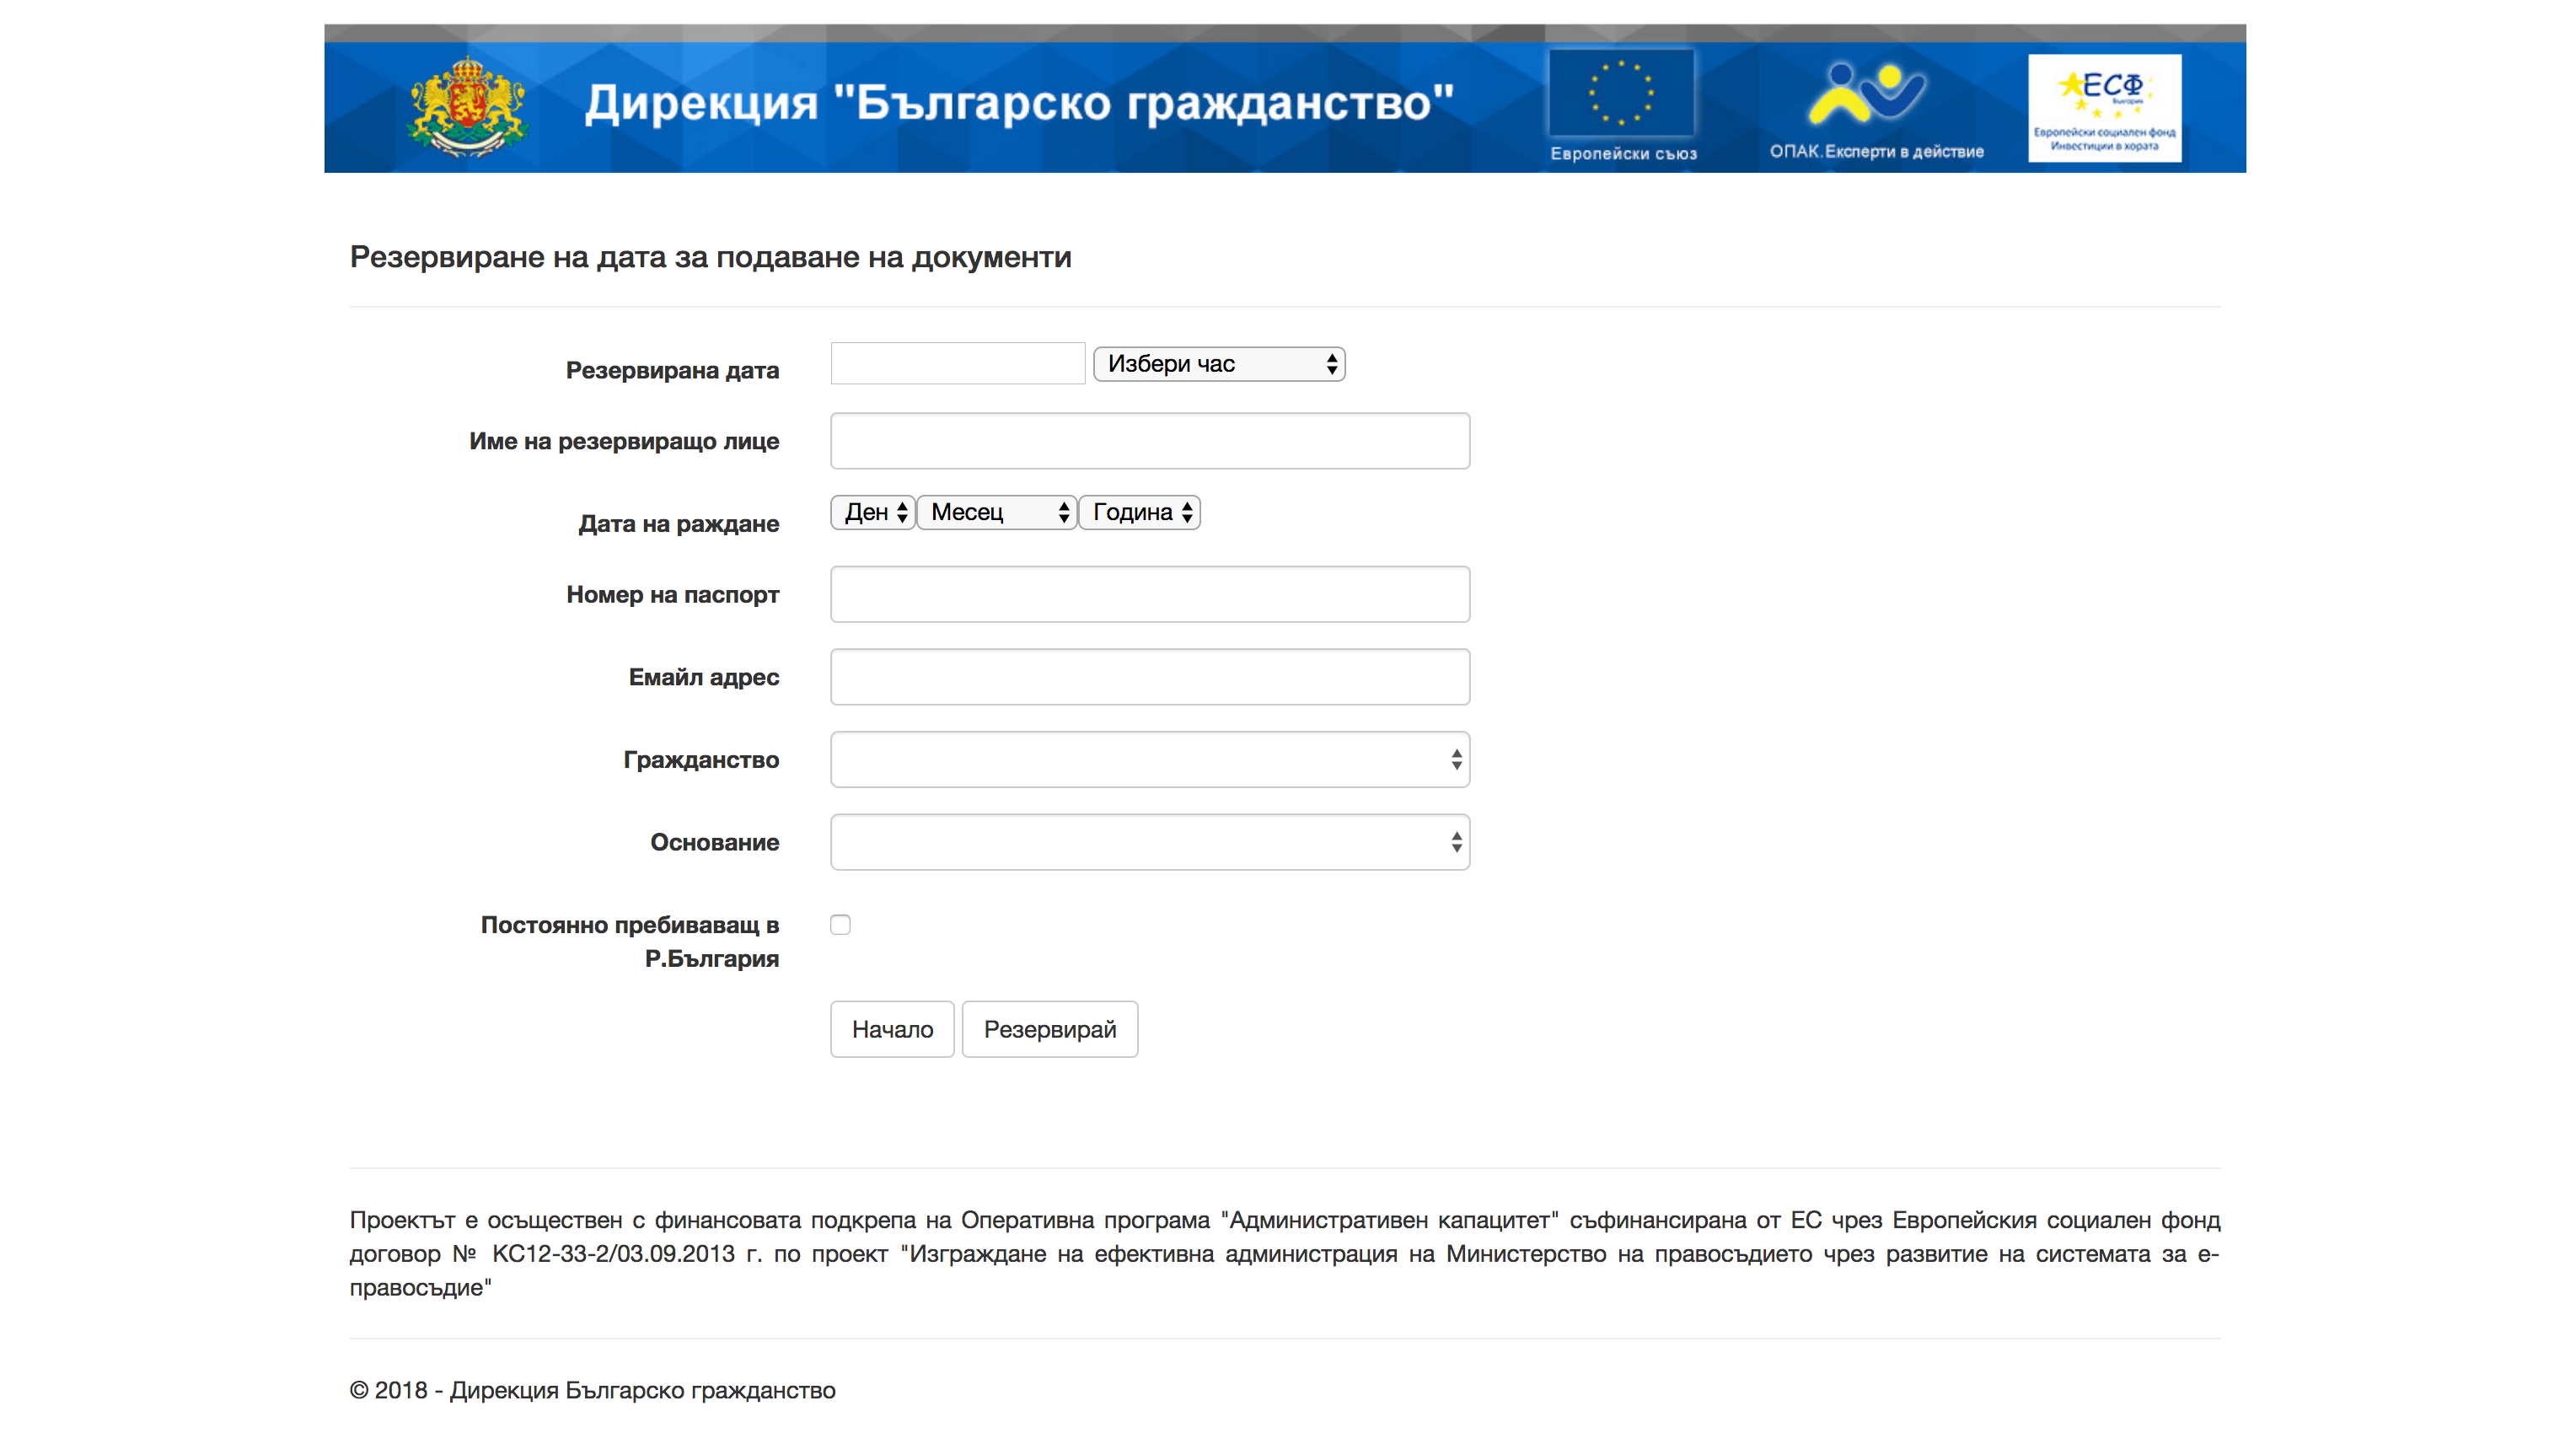 Bulgarian citizenship